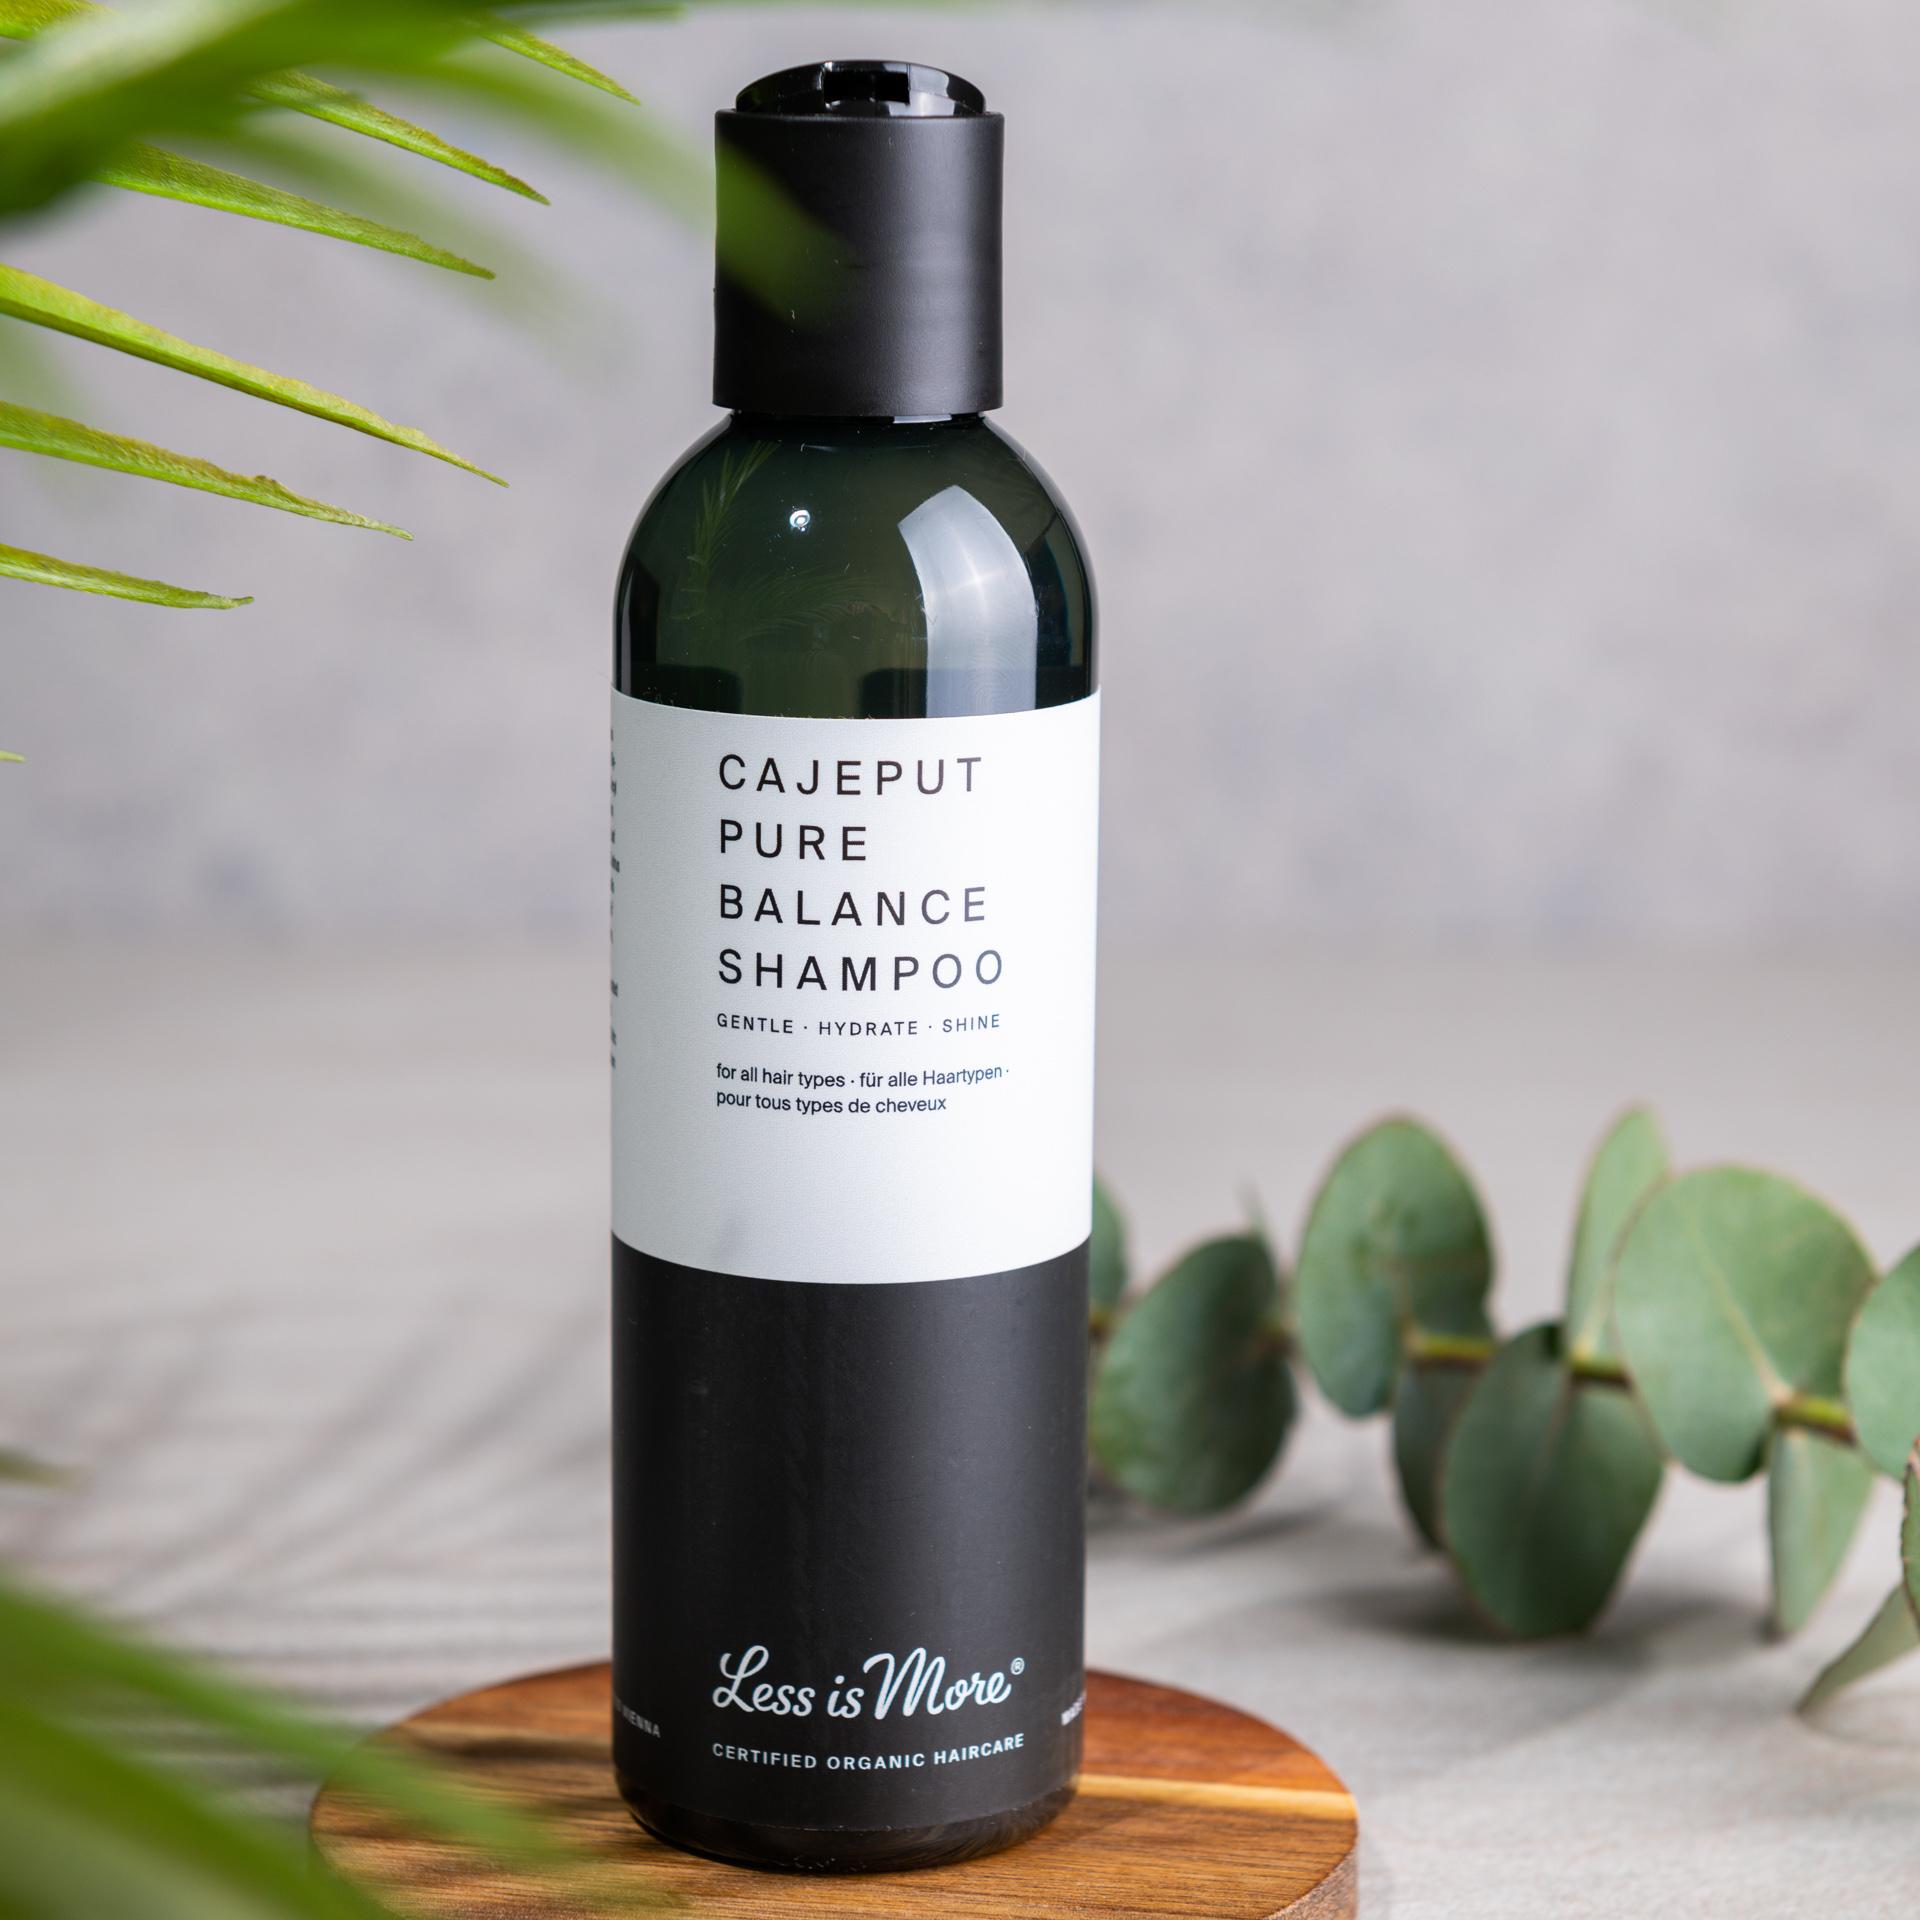 Cajeput Pure Balance Shampoo